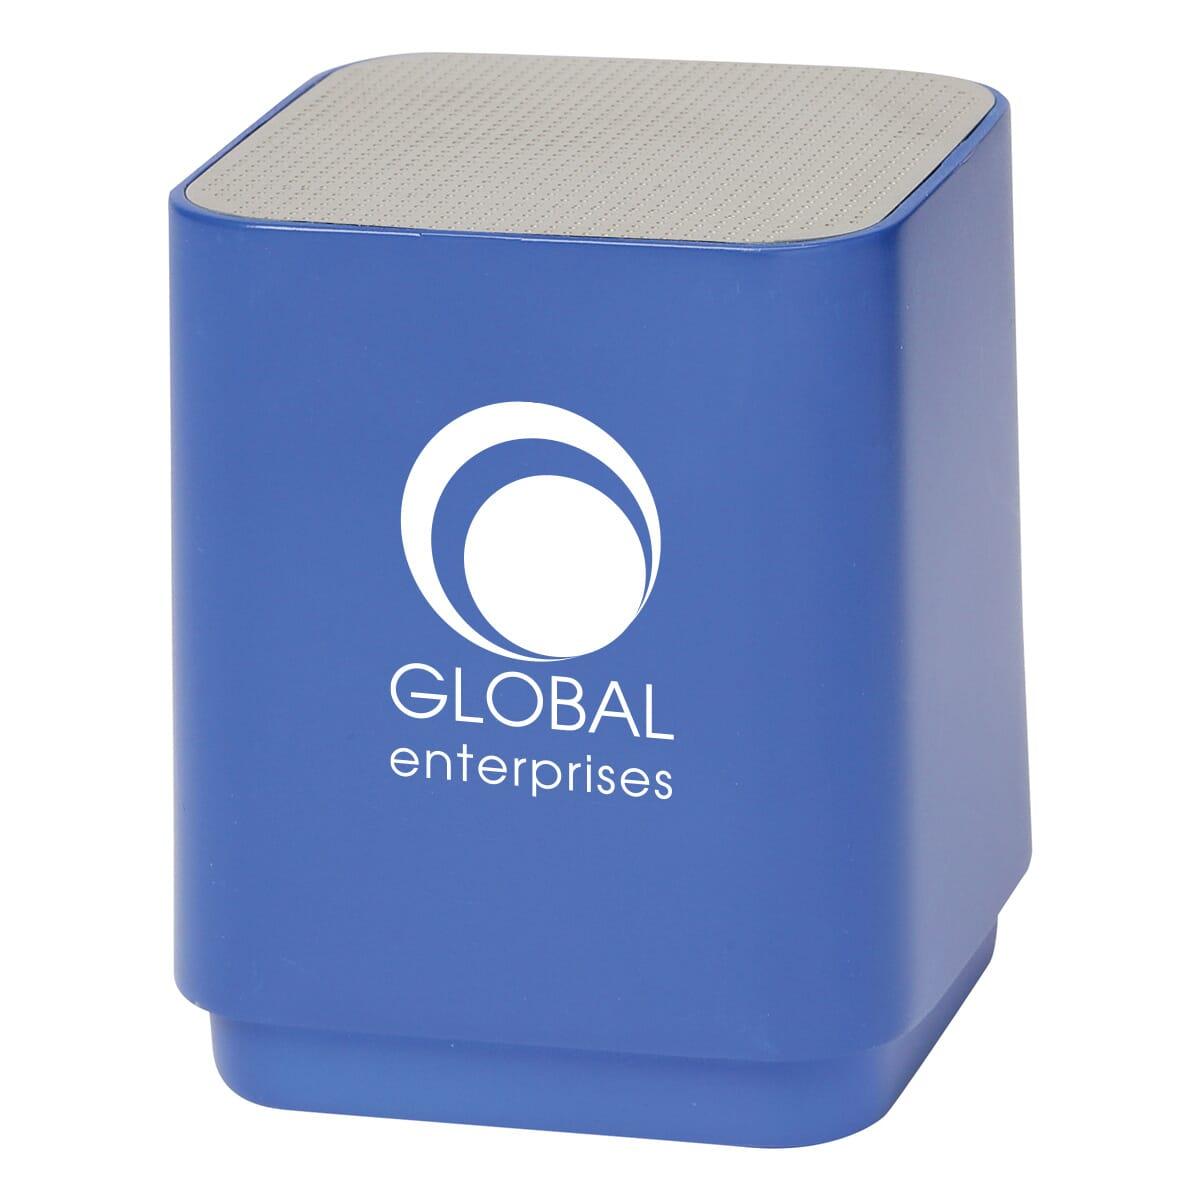 Bluetooth speaker with light-up logo